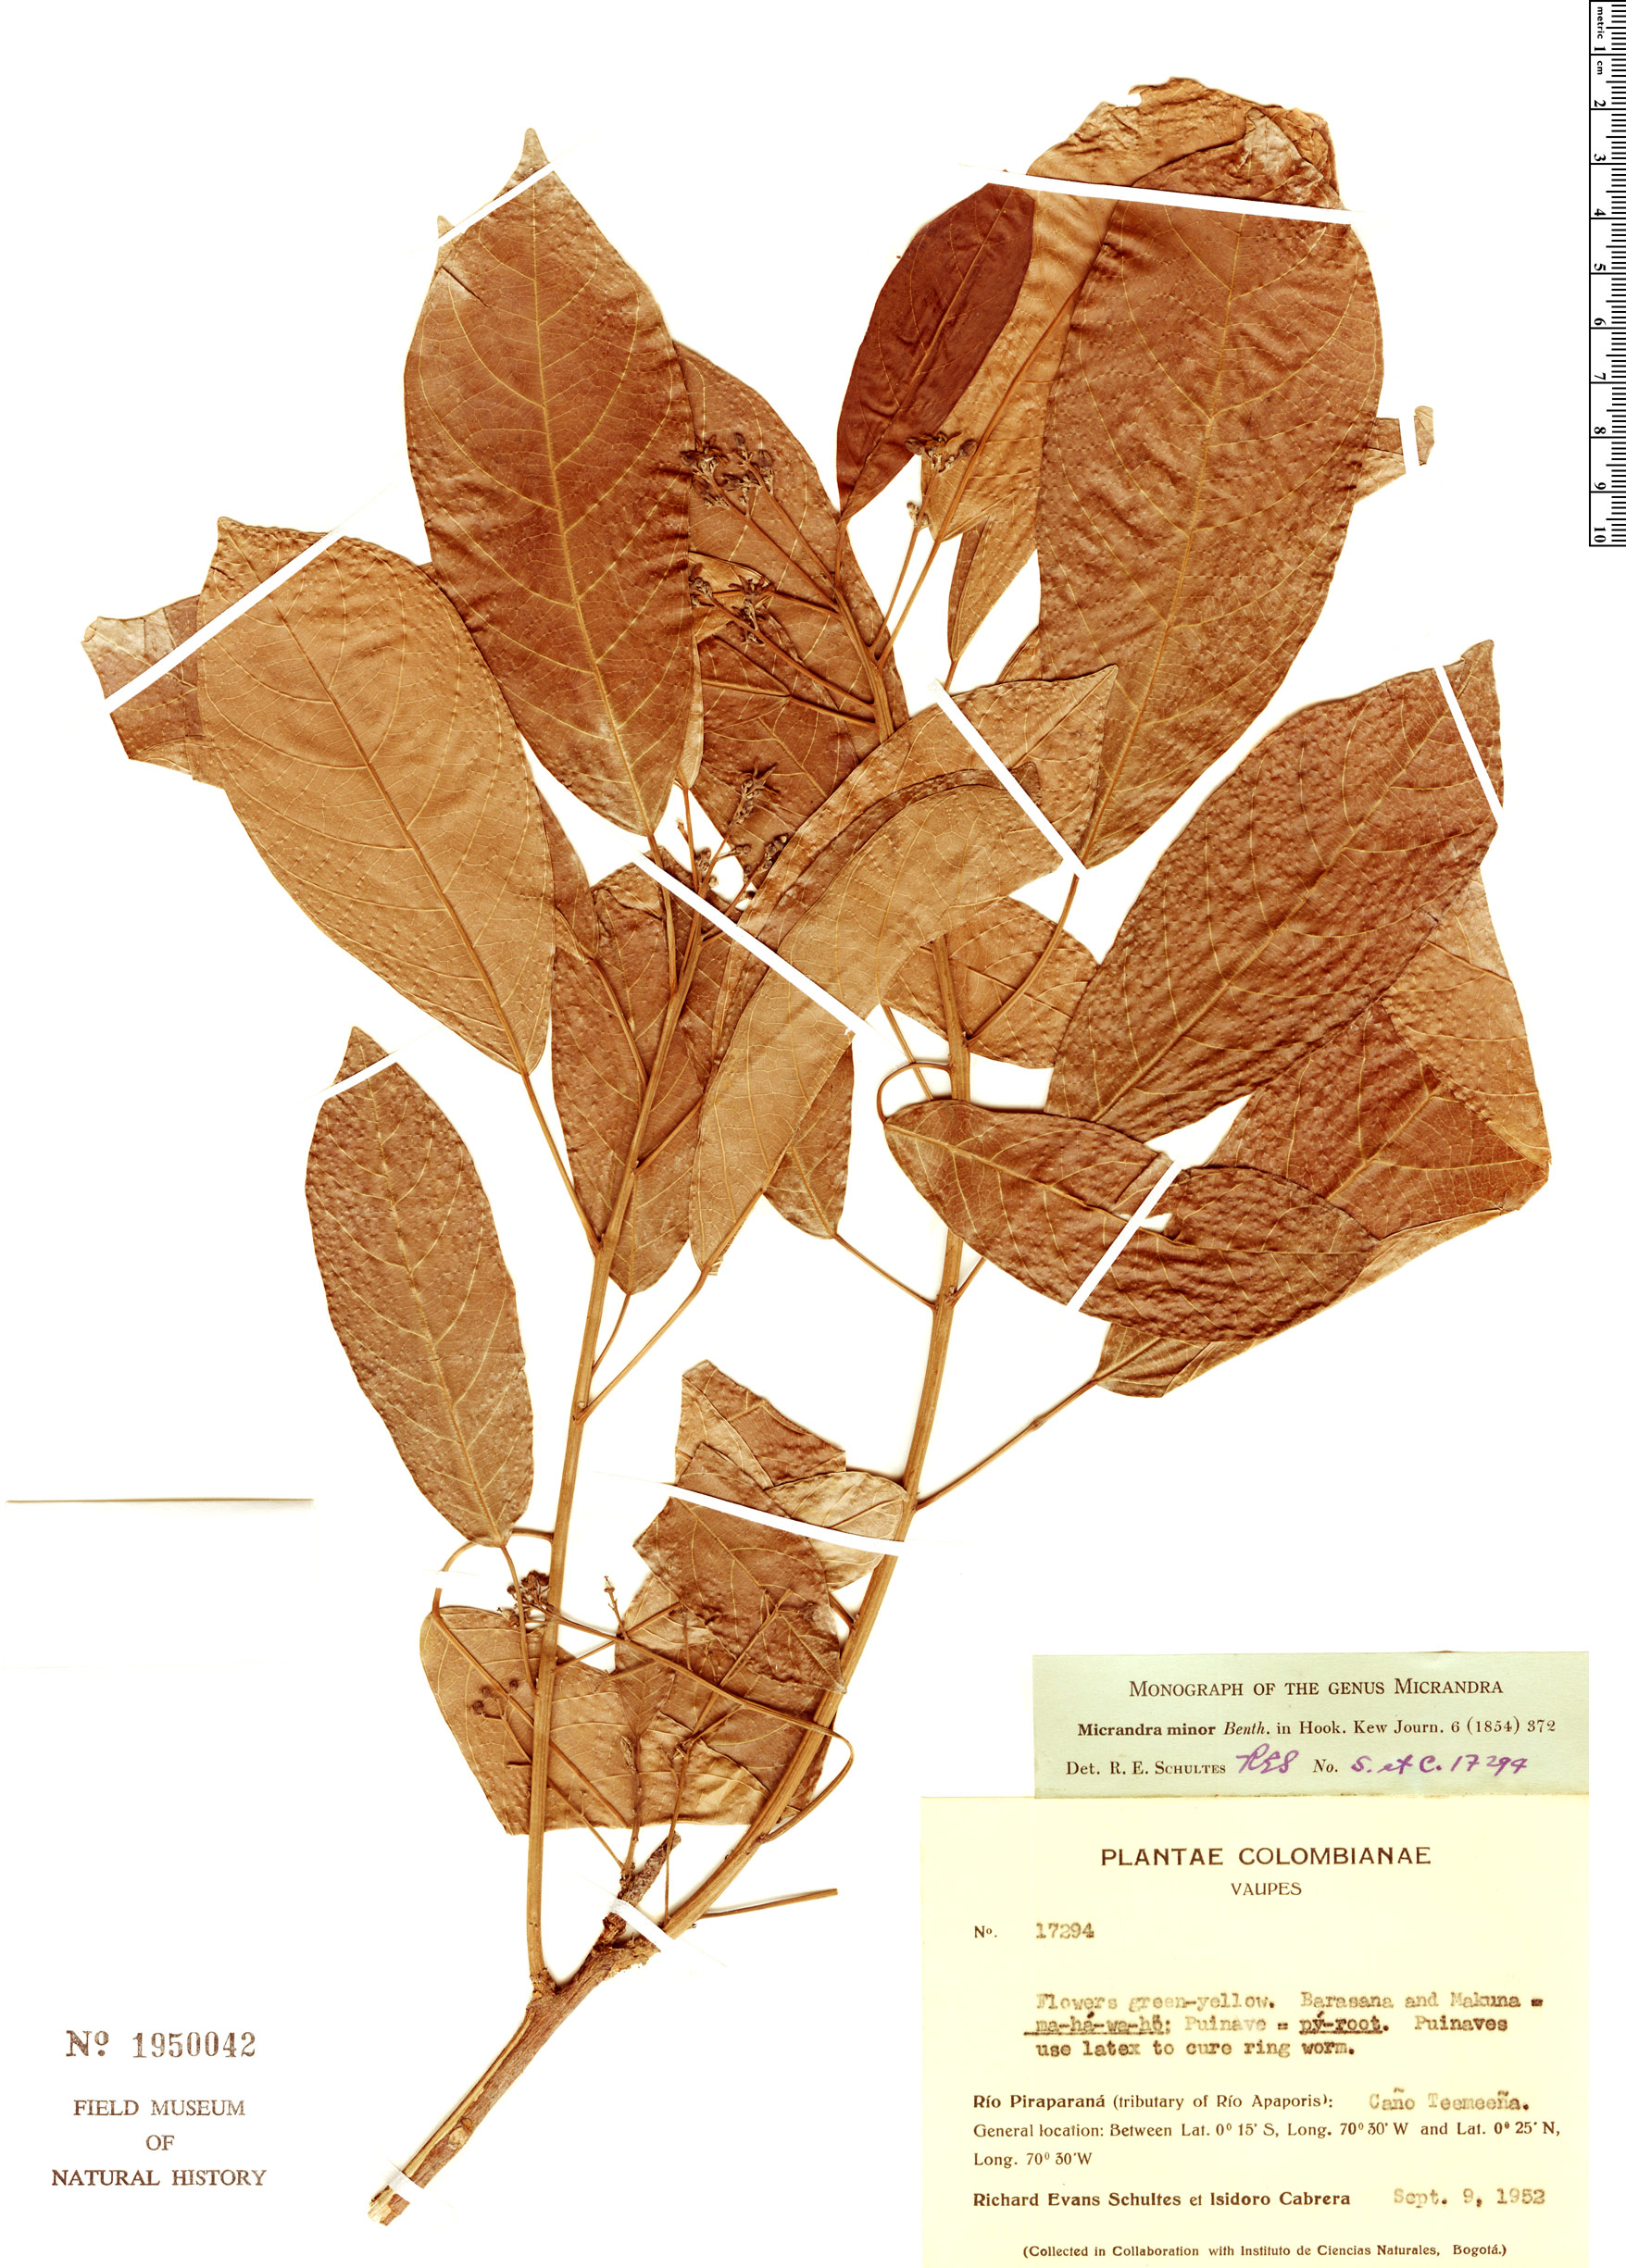 Specimen: Micrandra minor